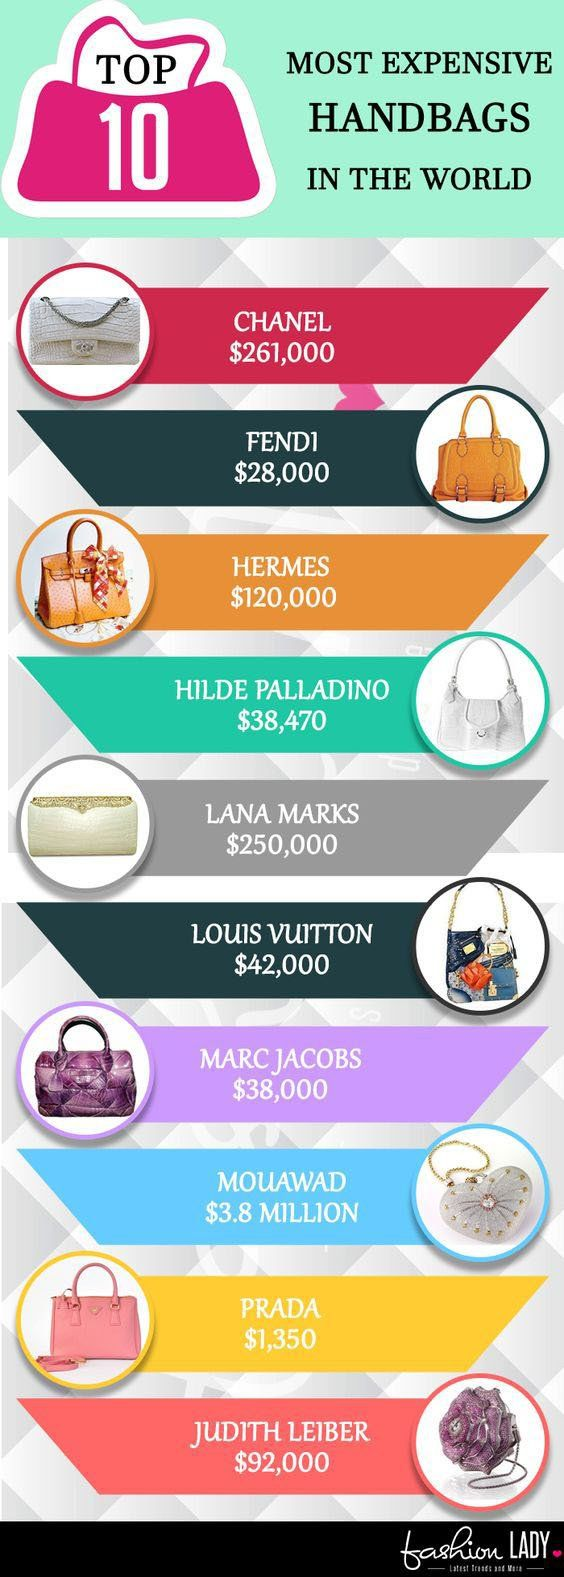 78460d5f05d8 Οι πιο ακριβές γυναικείες τσάντες στον κόσμο.. - https://kaftipiperia.